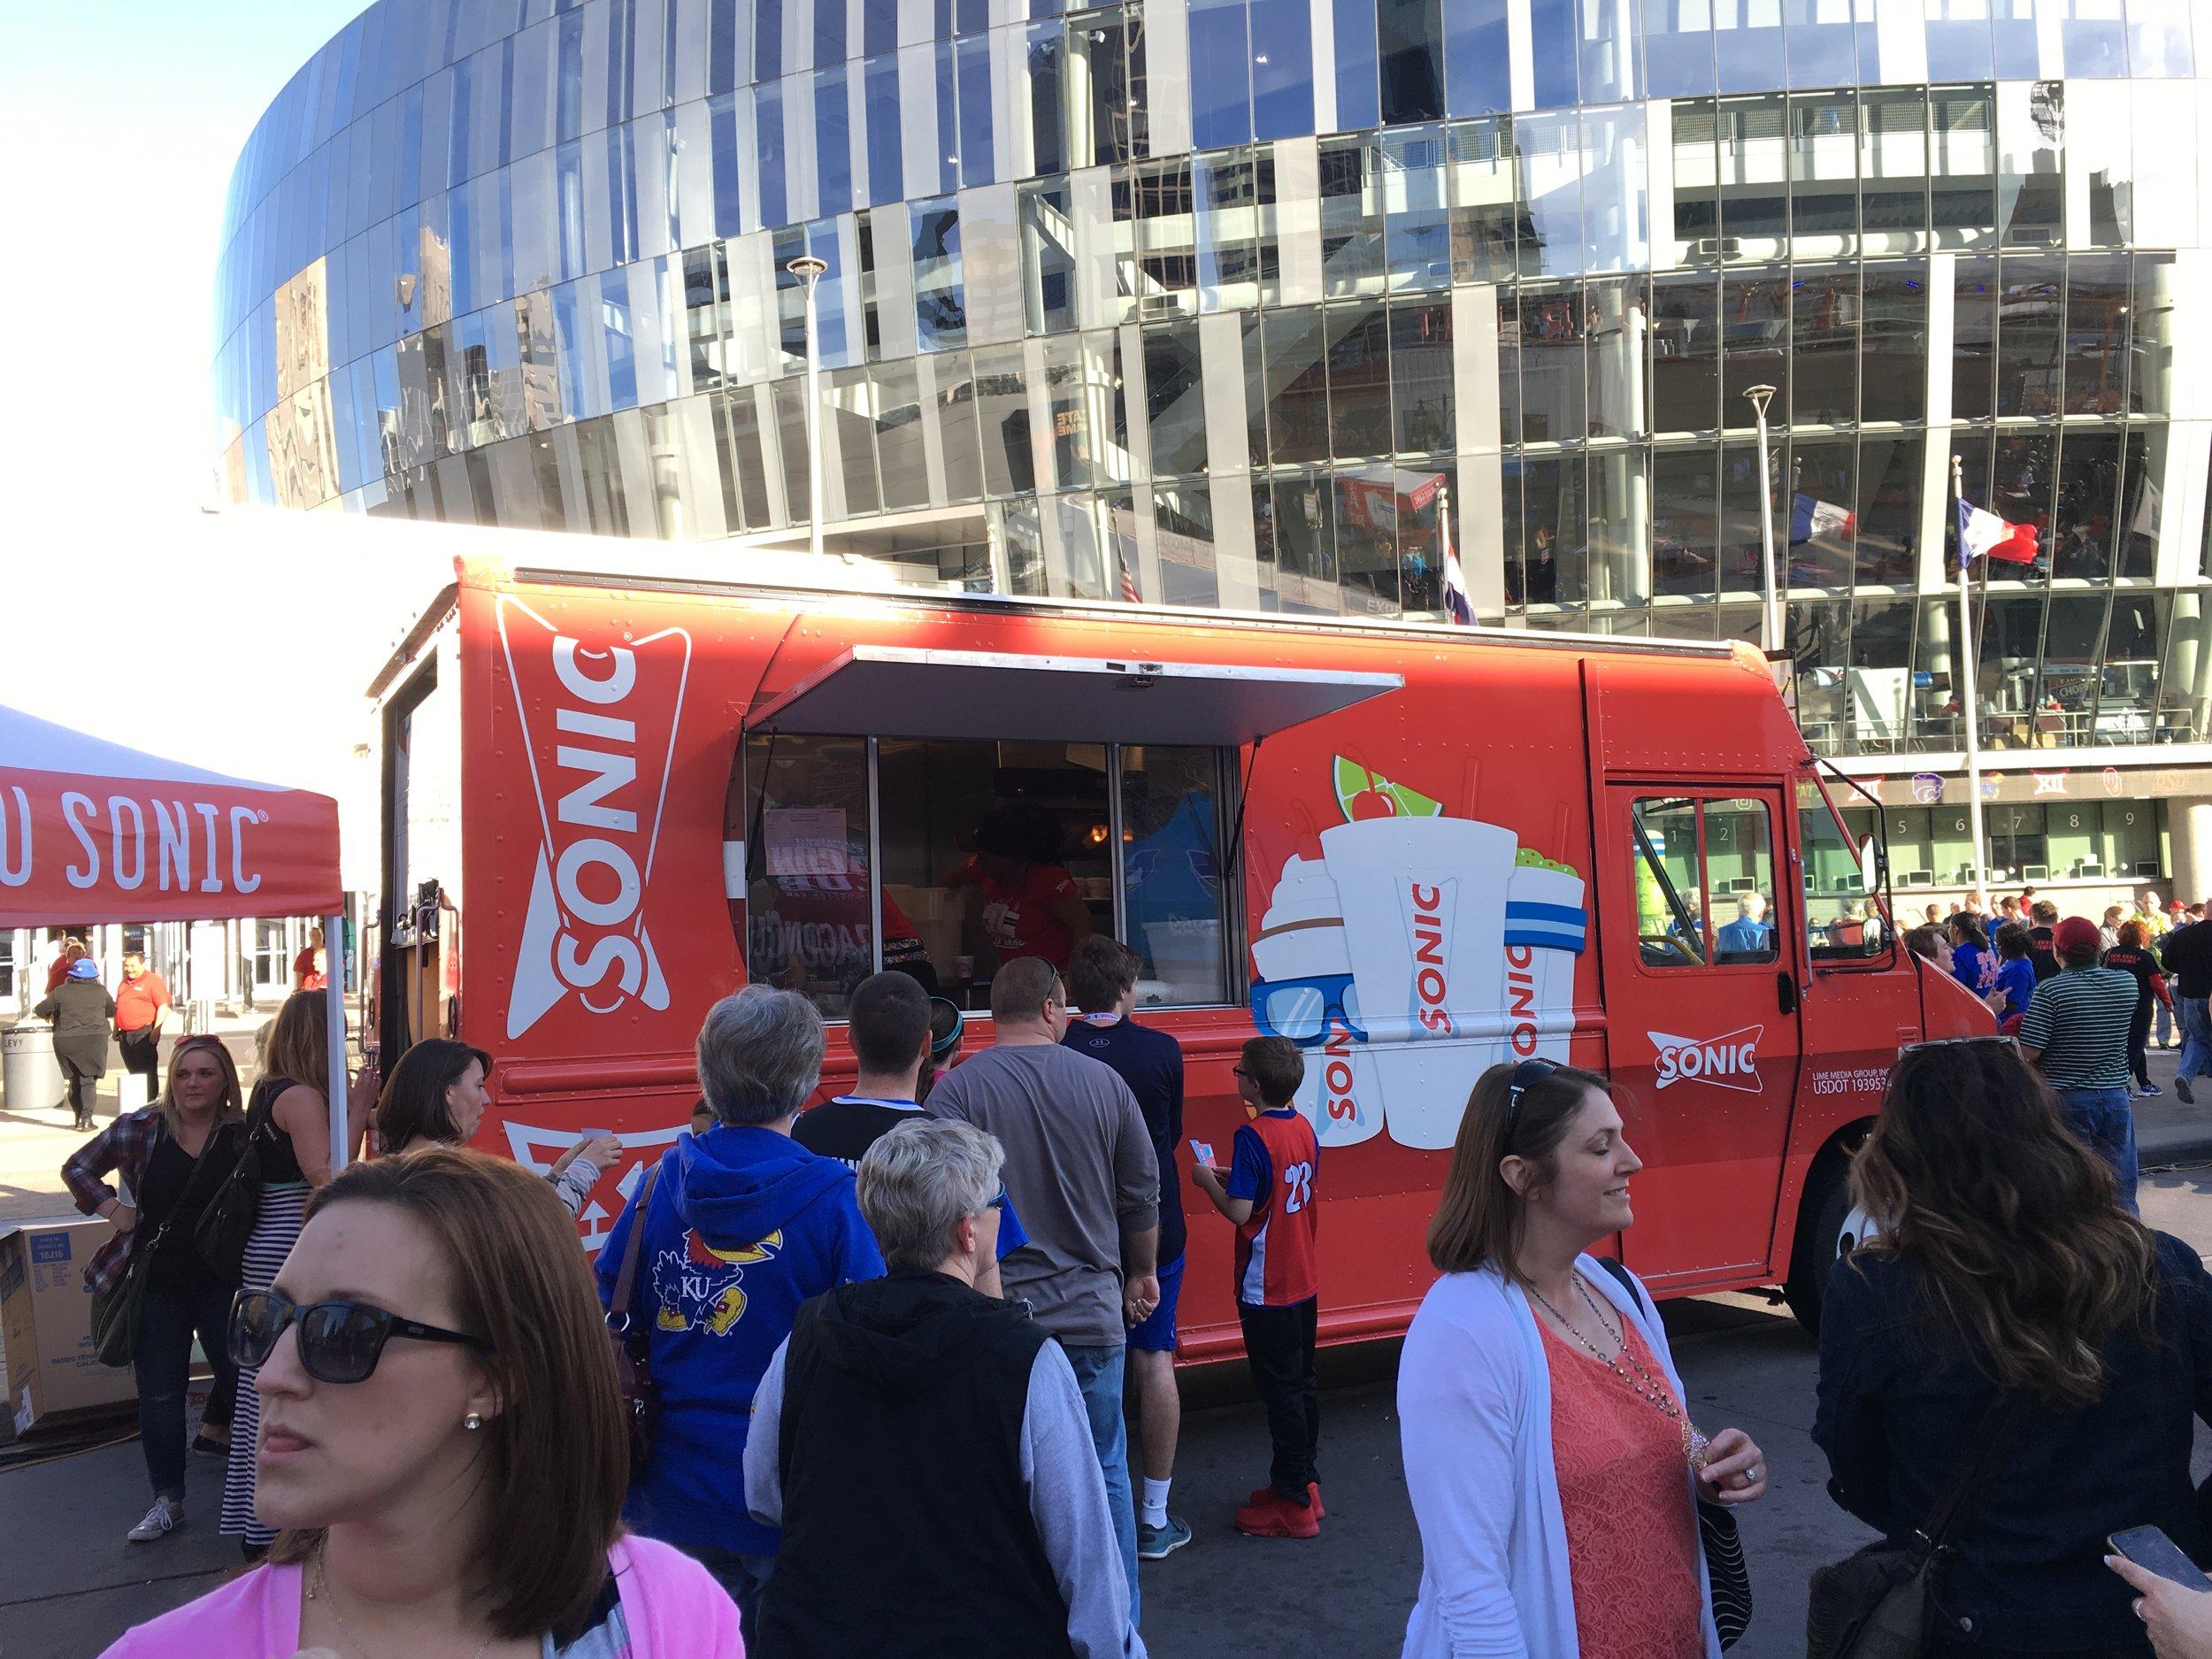 Scion-food-truck2.JPG